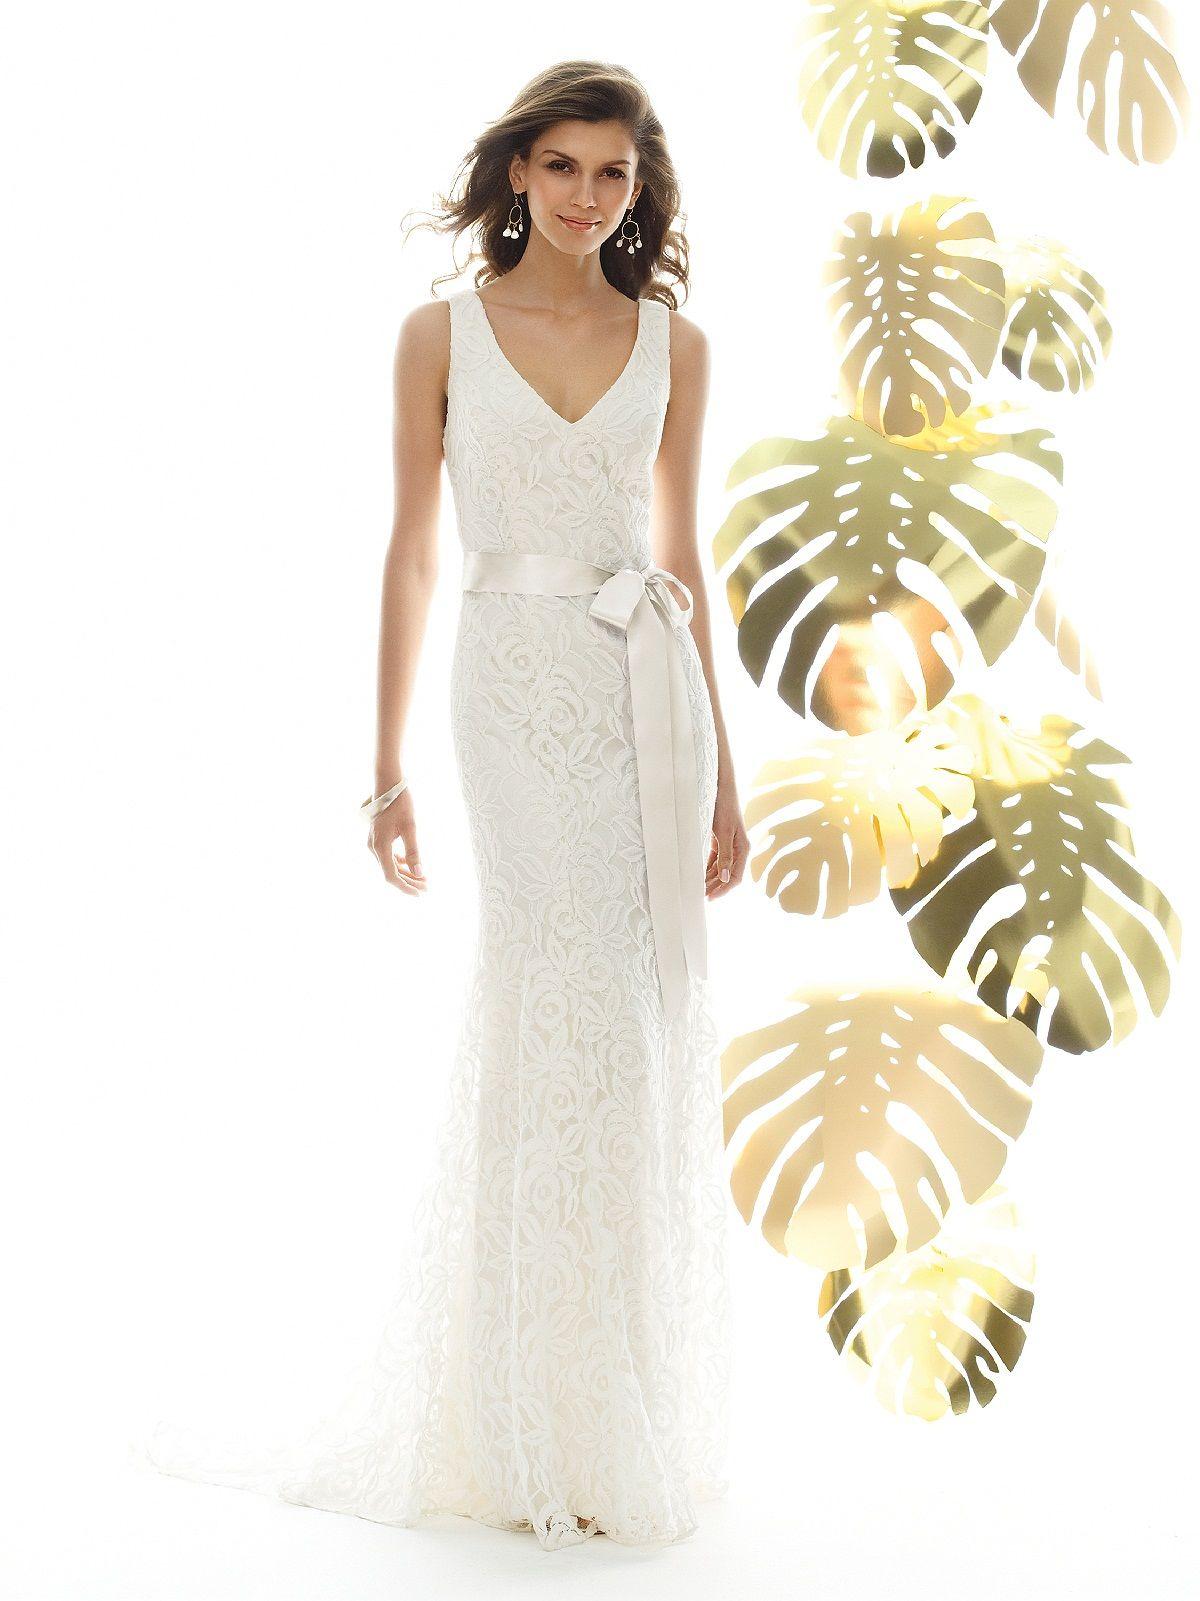 Simple beach wedding dress  Simple yet stunning  W e d d i n g  Pinterest  Lace beach wedding